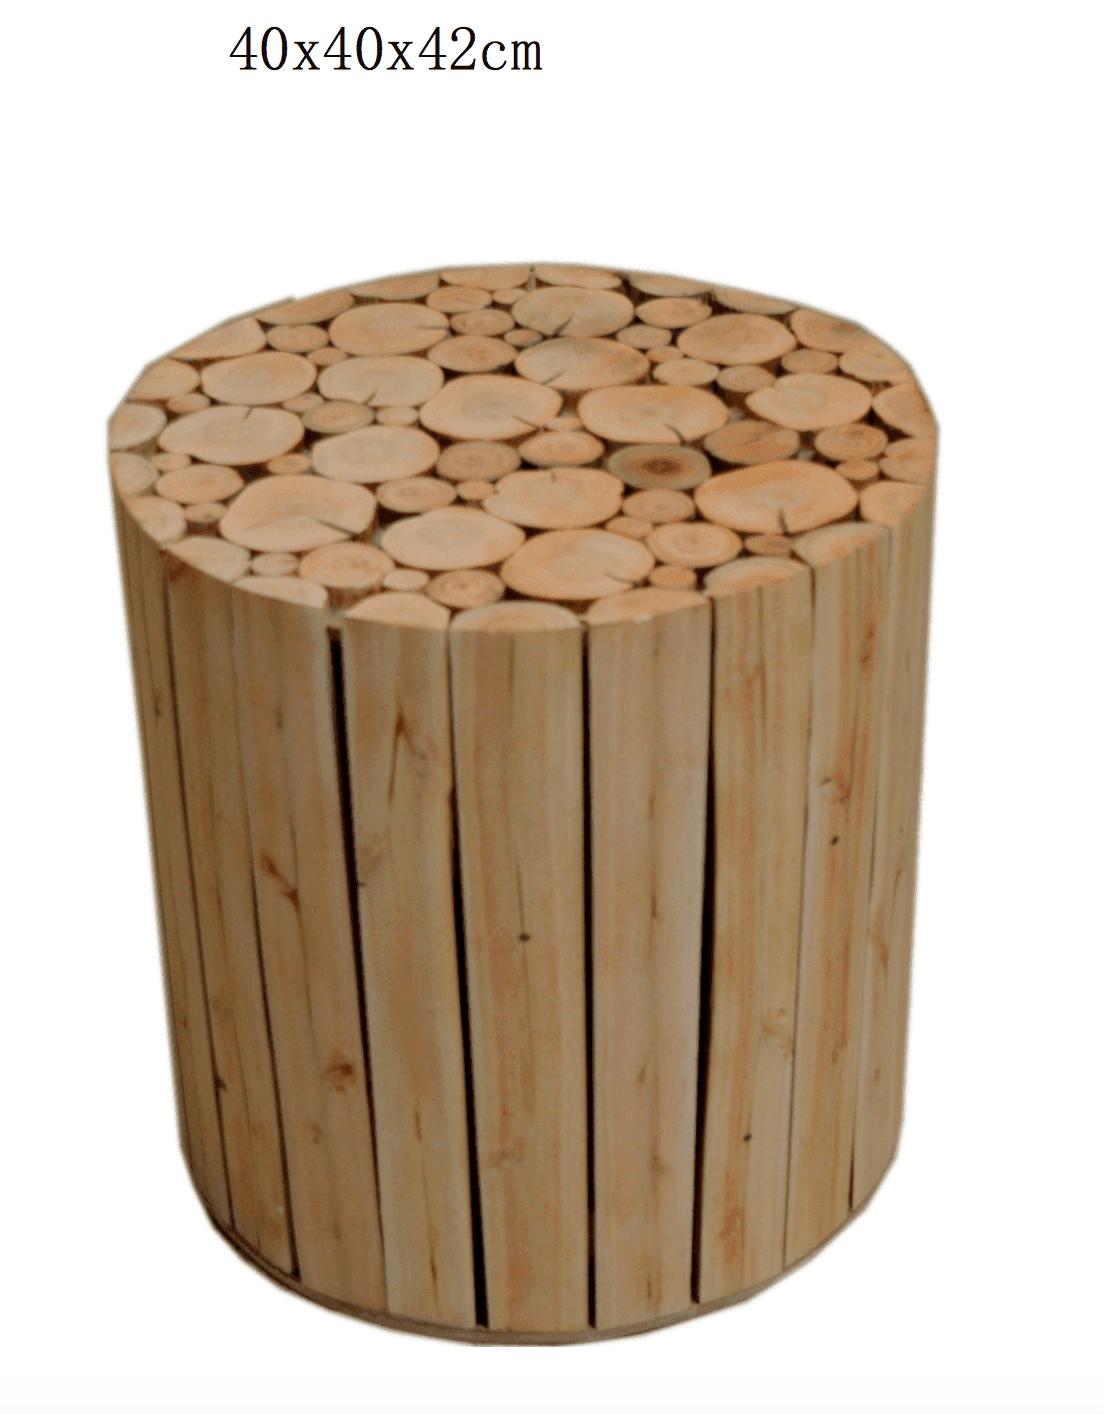 Pouf bois eucalyptus scandinave 4